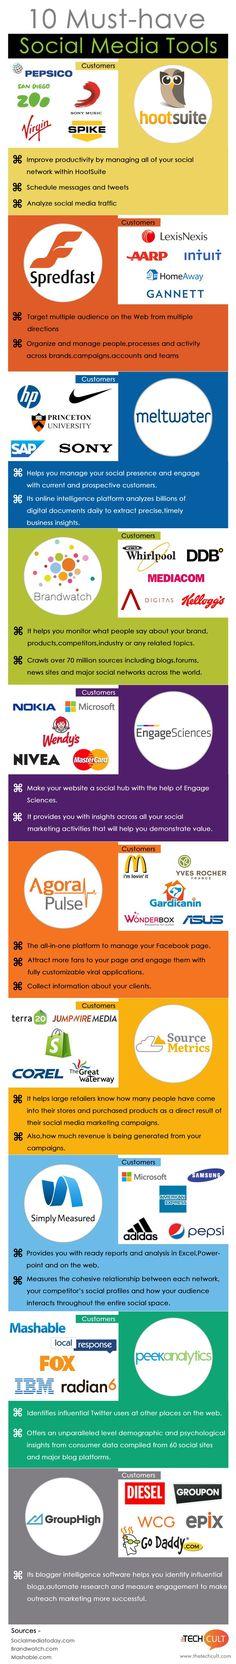 10 Must Have Social Media Tools - Infographic #emarketing #SocialMedia #MédiasSociaux